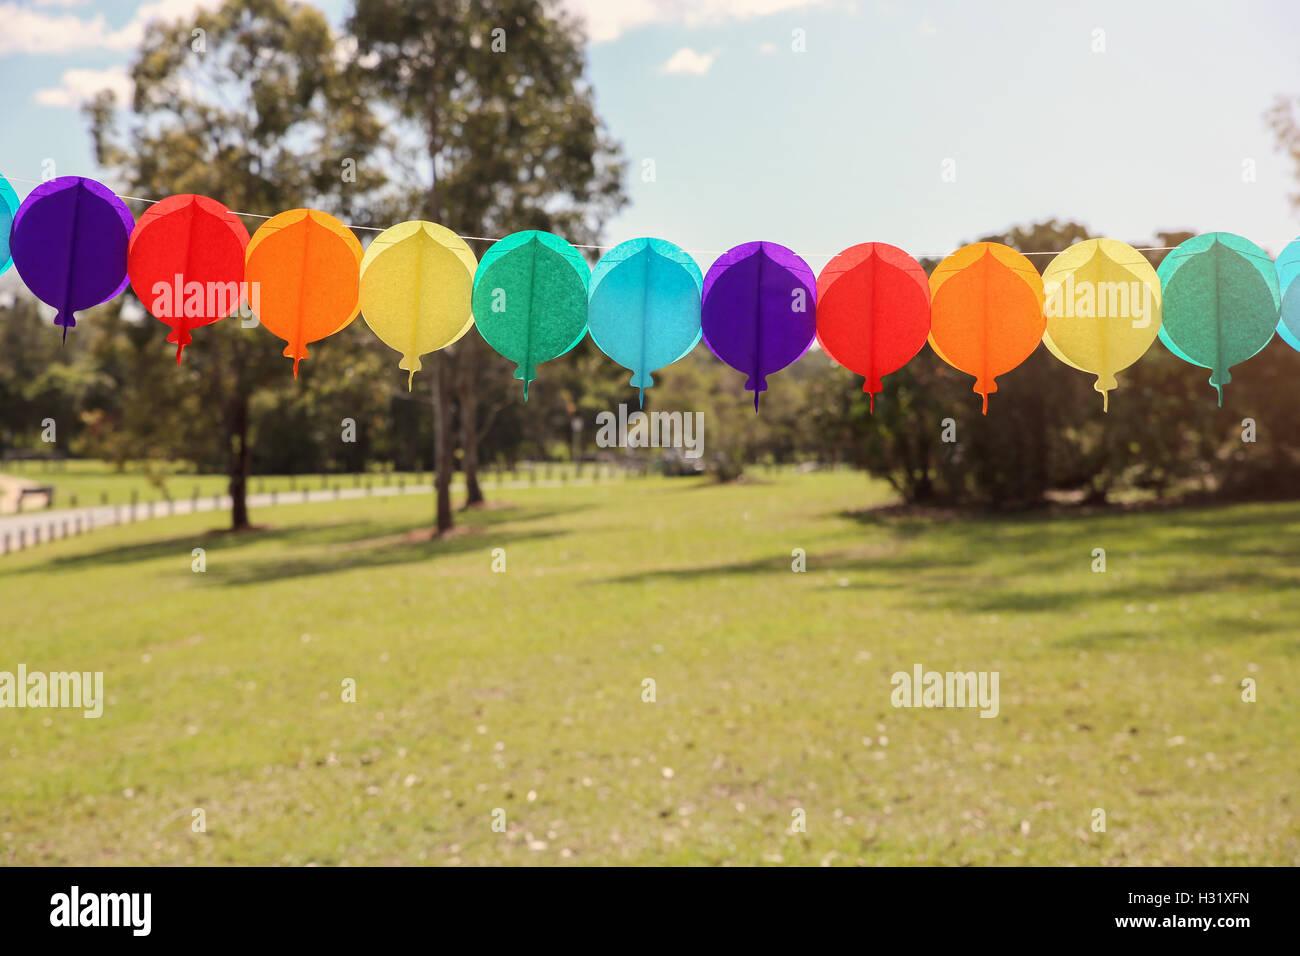 Rainbow Paper Stock Photos & Rainbow Paper Stock Images - Alamy